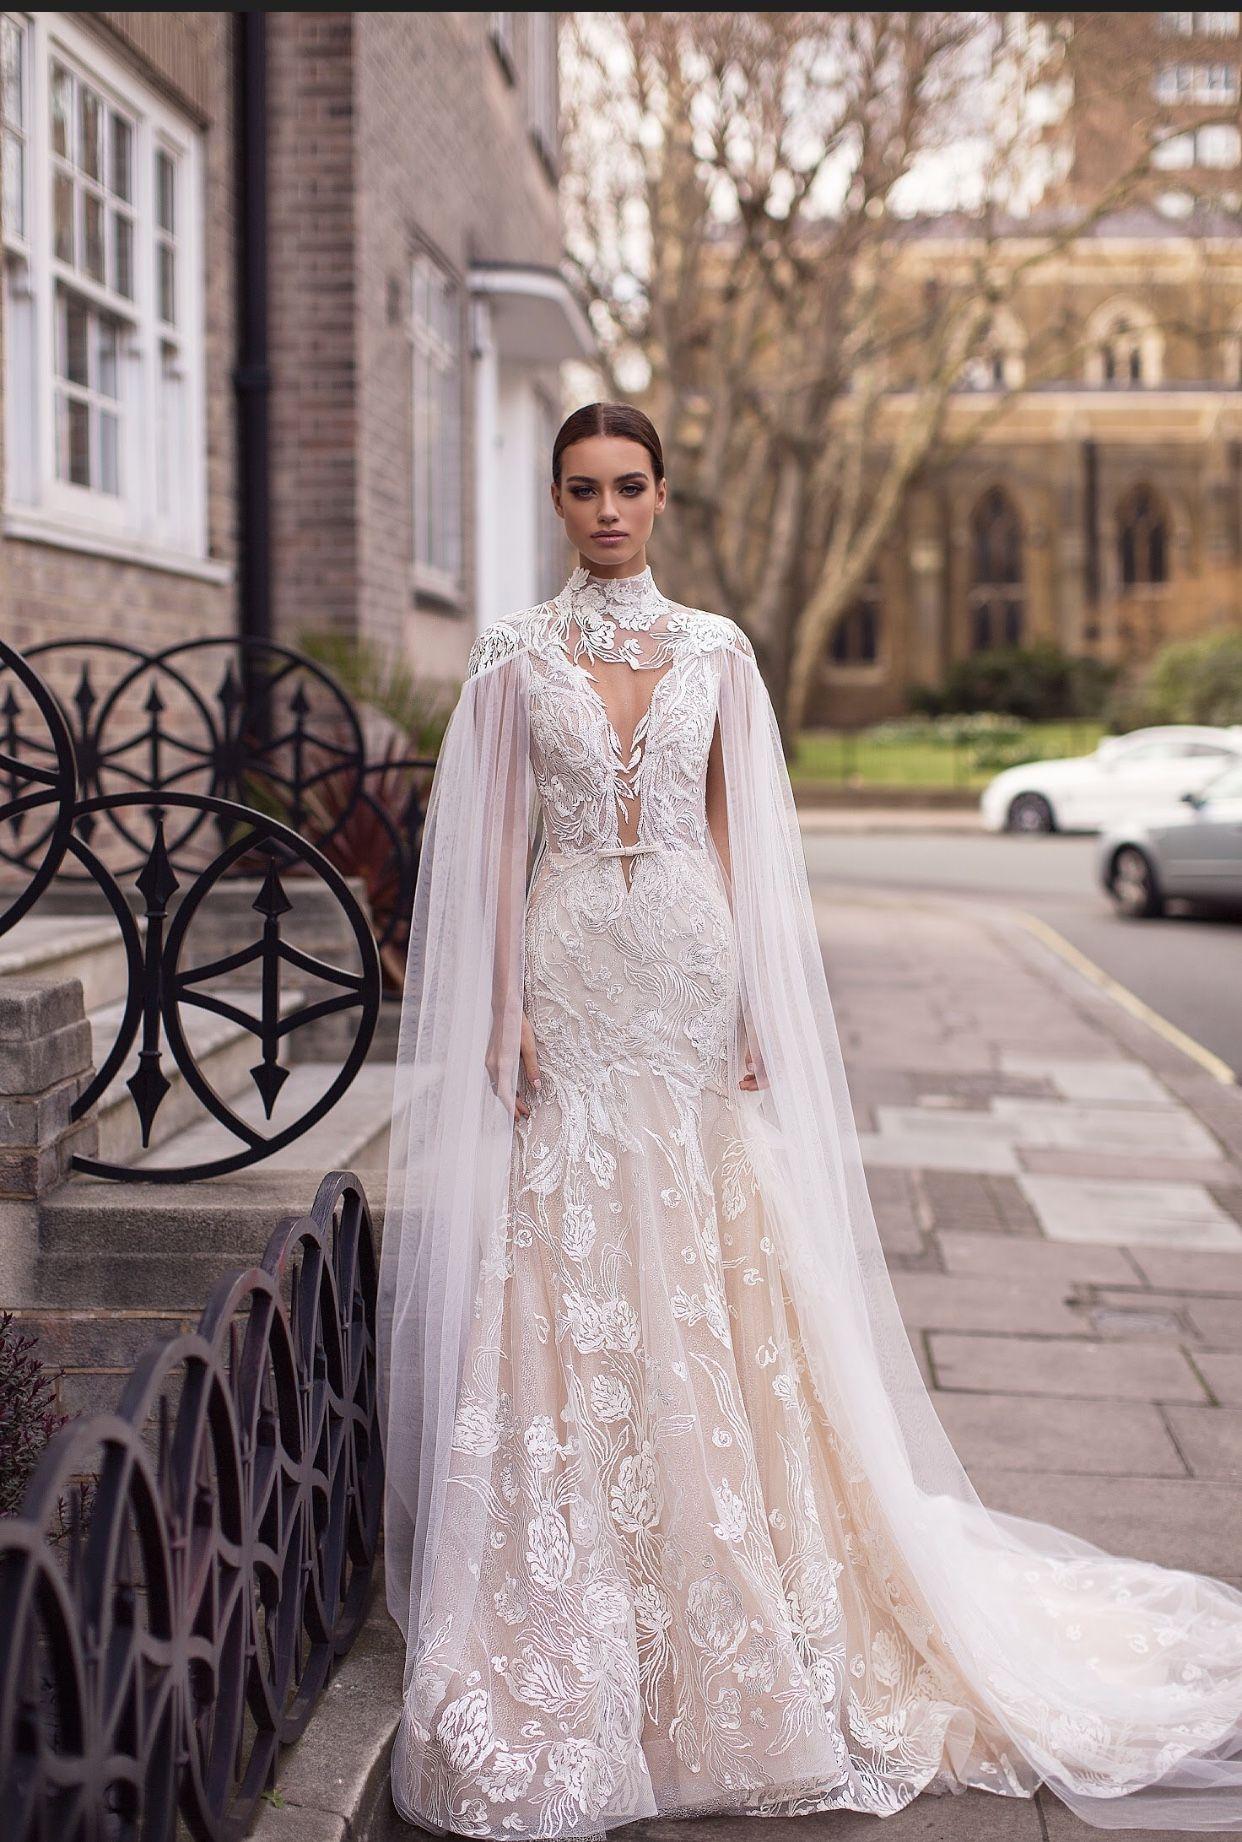 Lace Mermaid Wedding Dress Milla Nova High Neck Wedding Dress Wedding Dresses Designer Bridal Gowns [ 1842 x 1242 Pixel ]